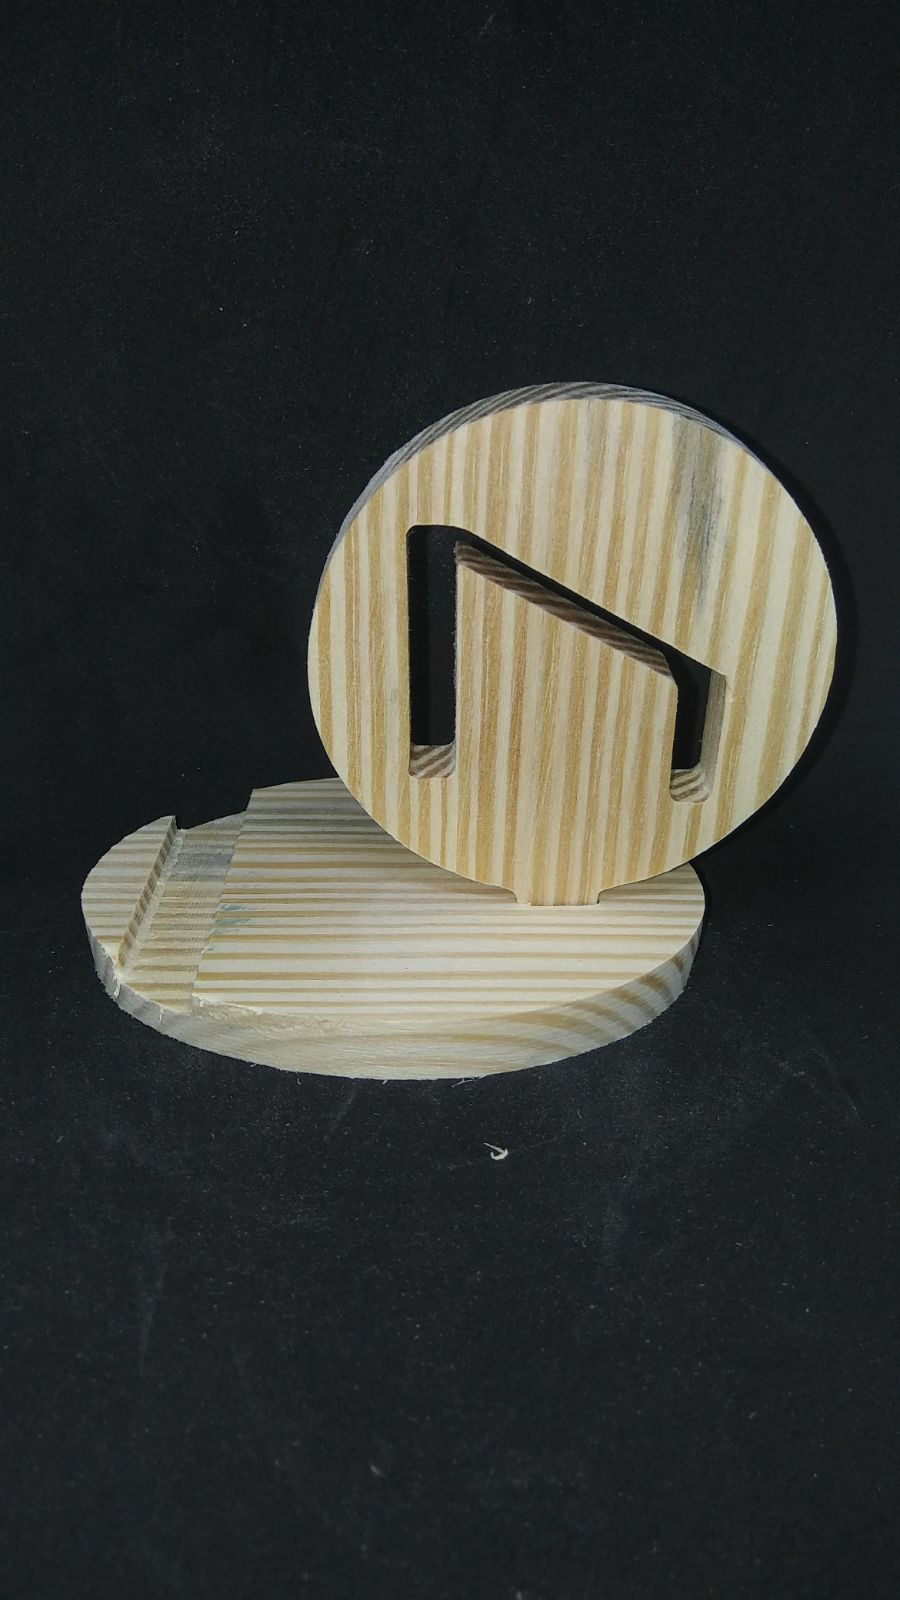 Wood Phone Stand - Strength